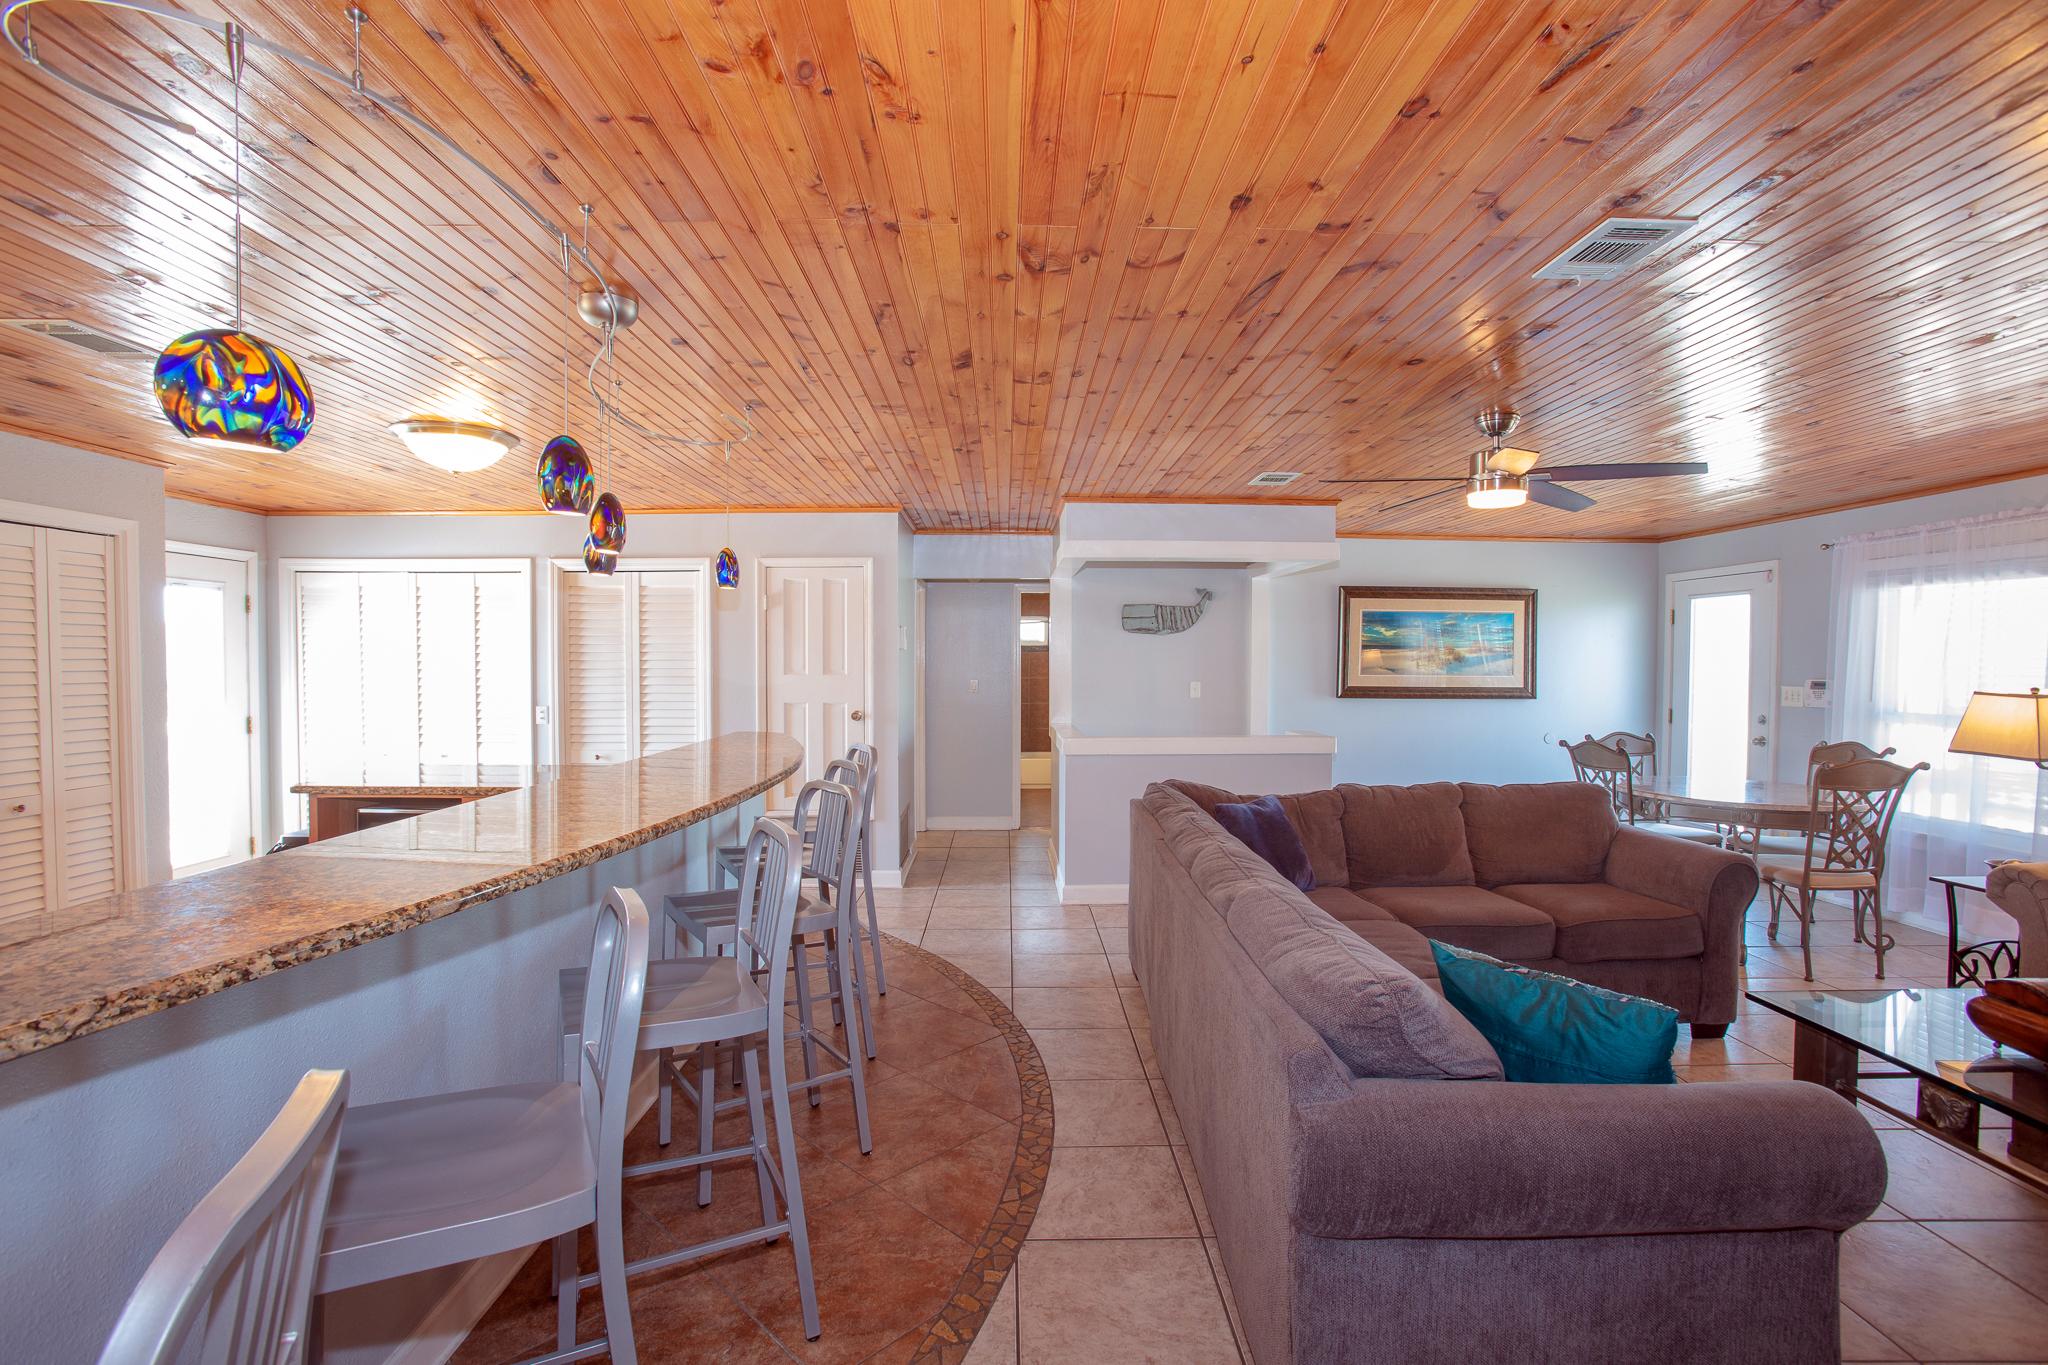 Maldonado 1015 - Sea the Big Picture House/Cottage rental in Pensacola Beach House Rentals in Pensacola Beach Florida - #5